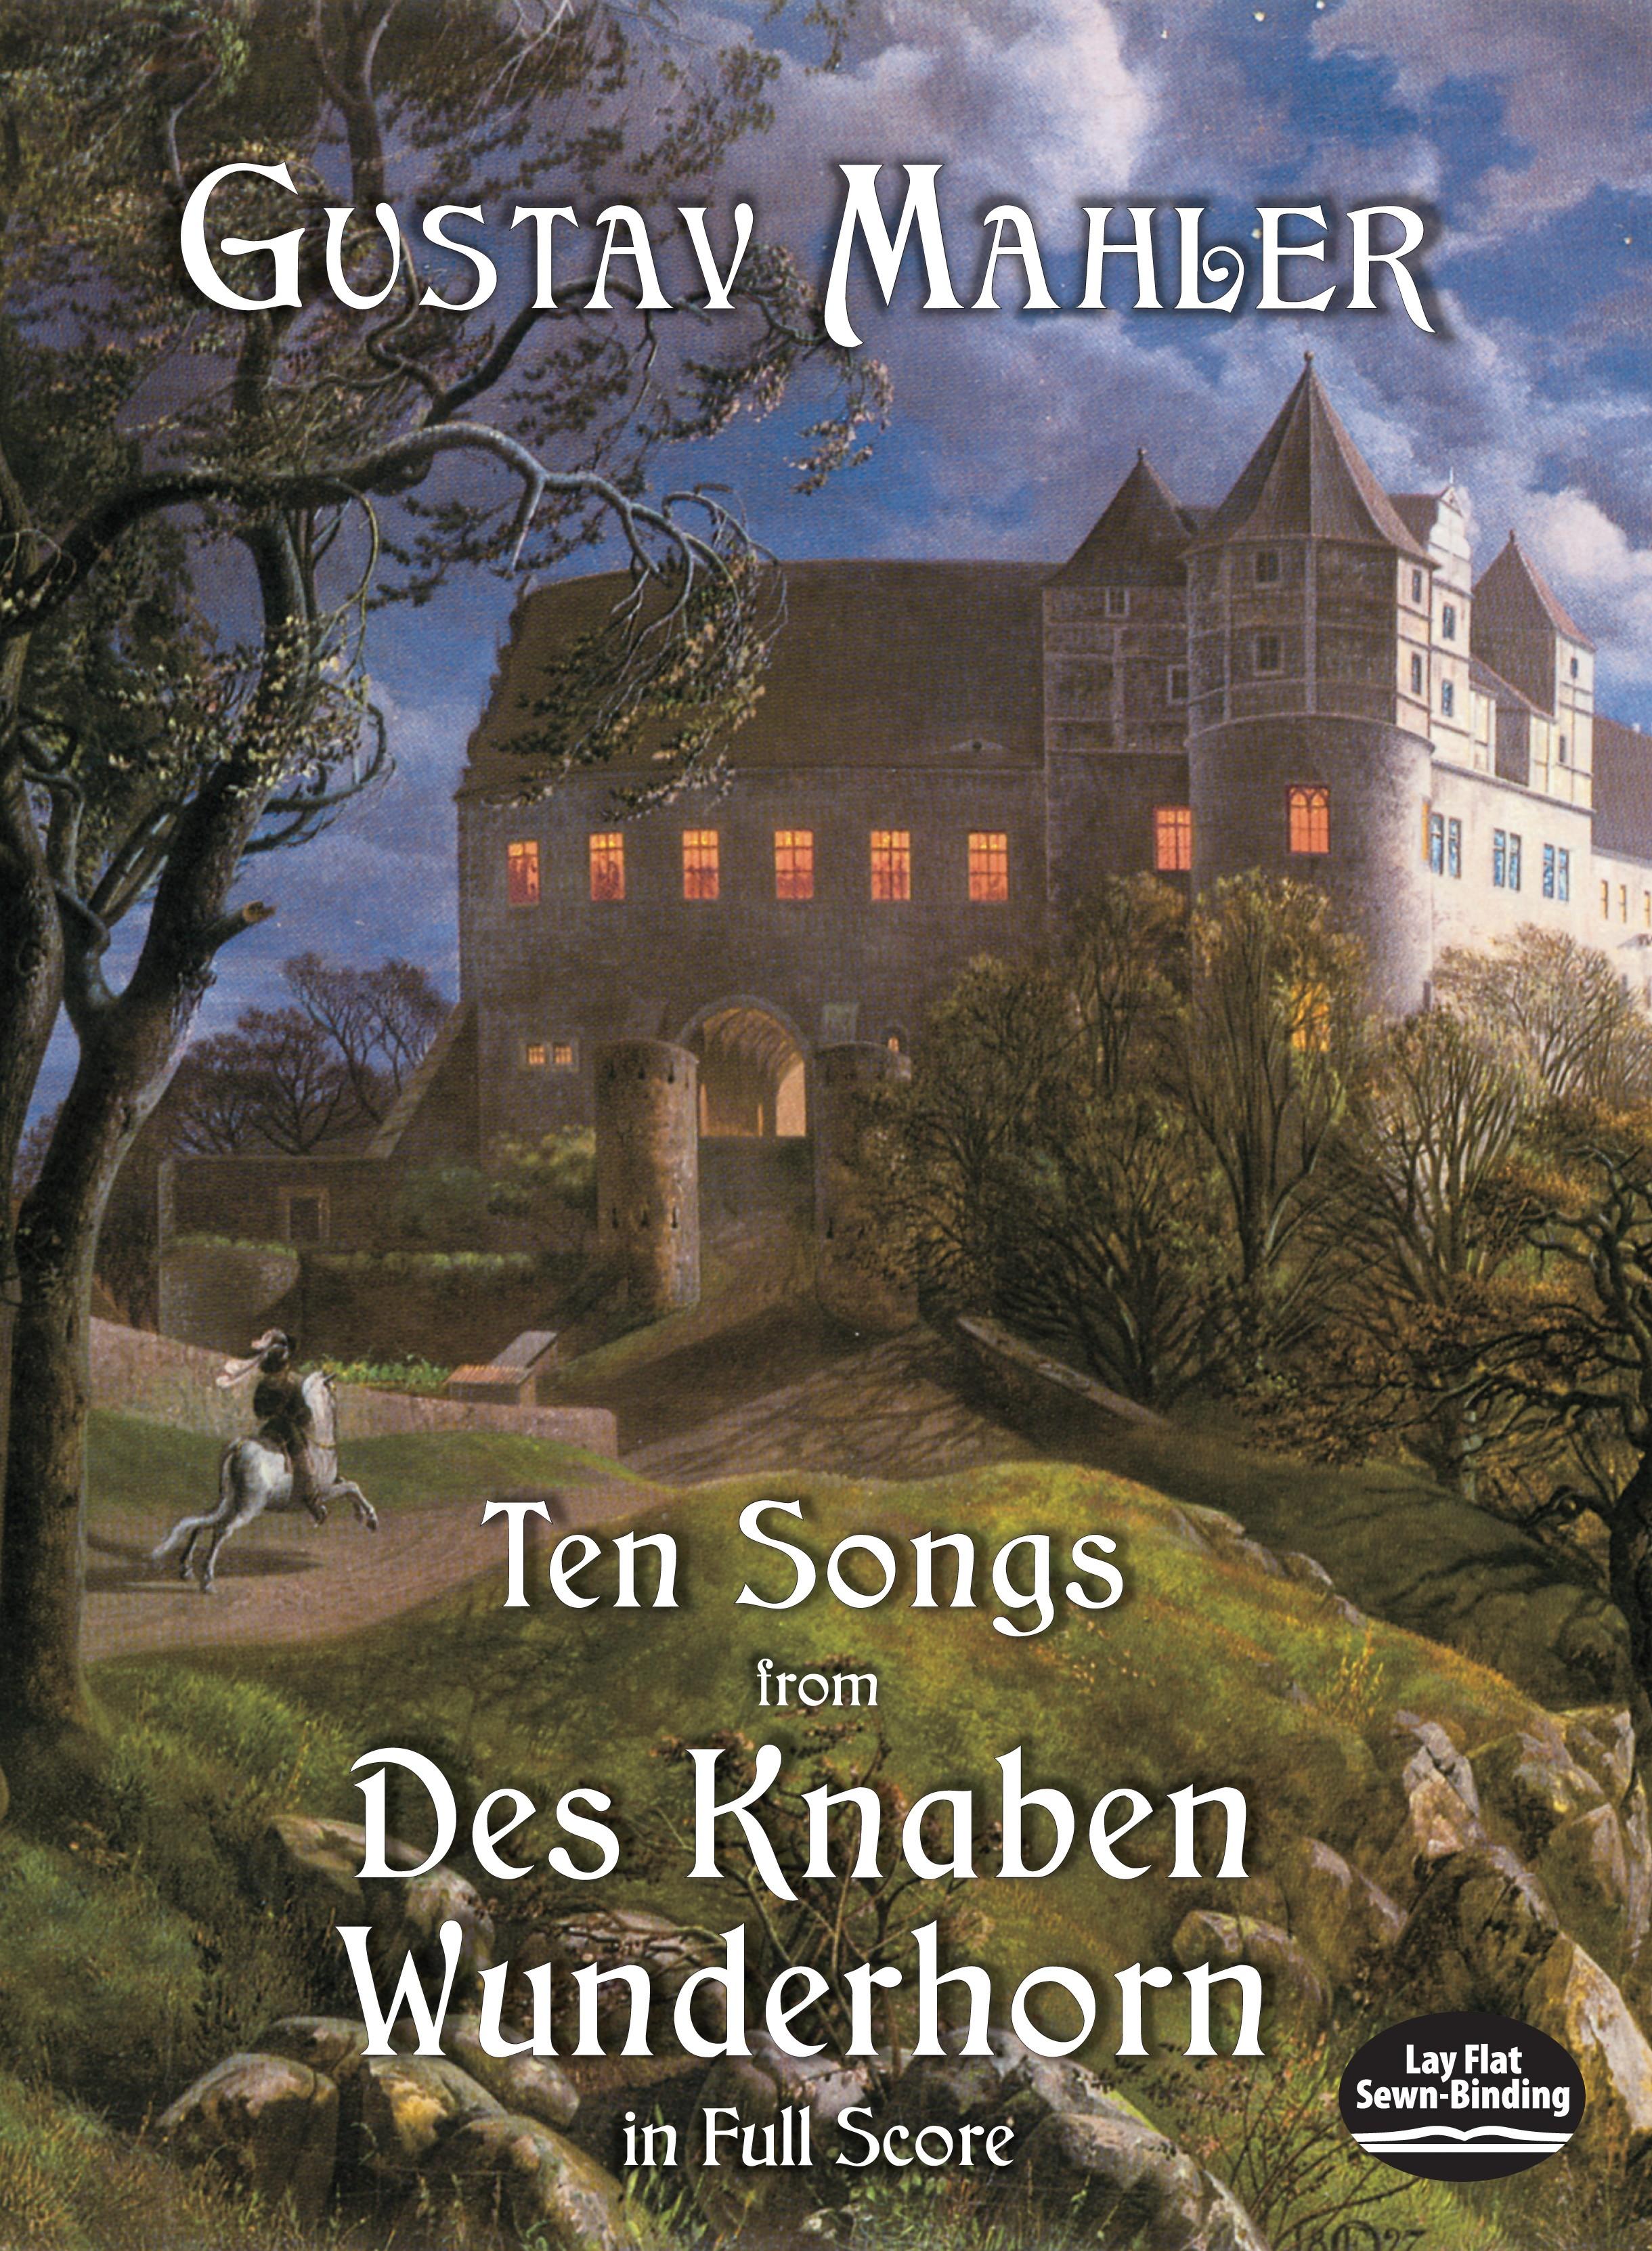 10 Songs from Des Knaben Wunderhorn